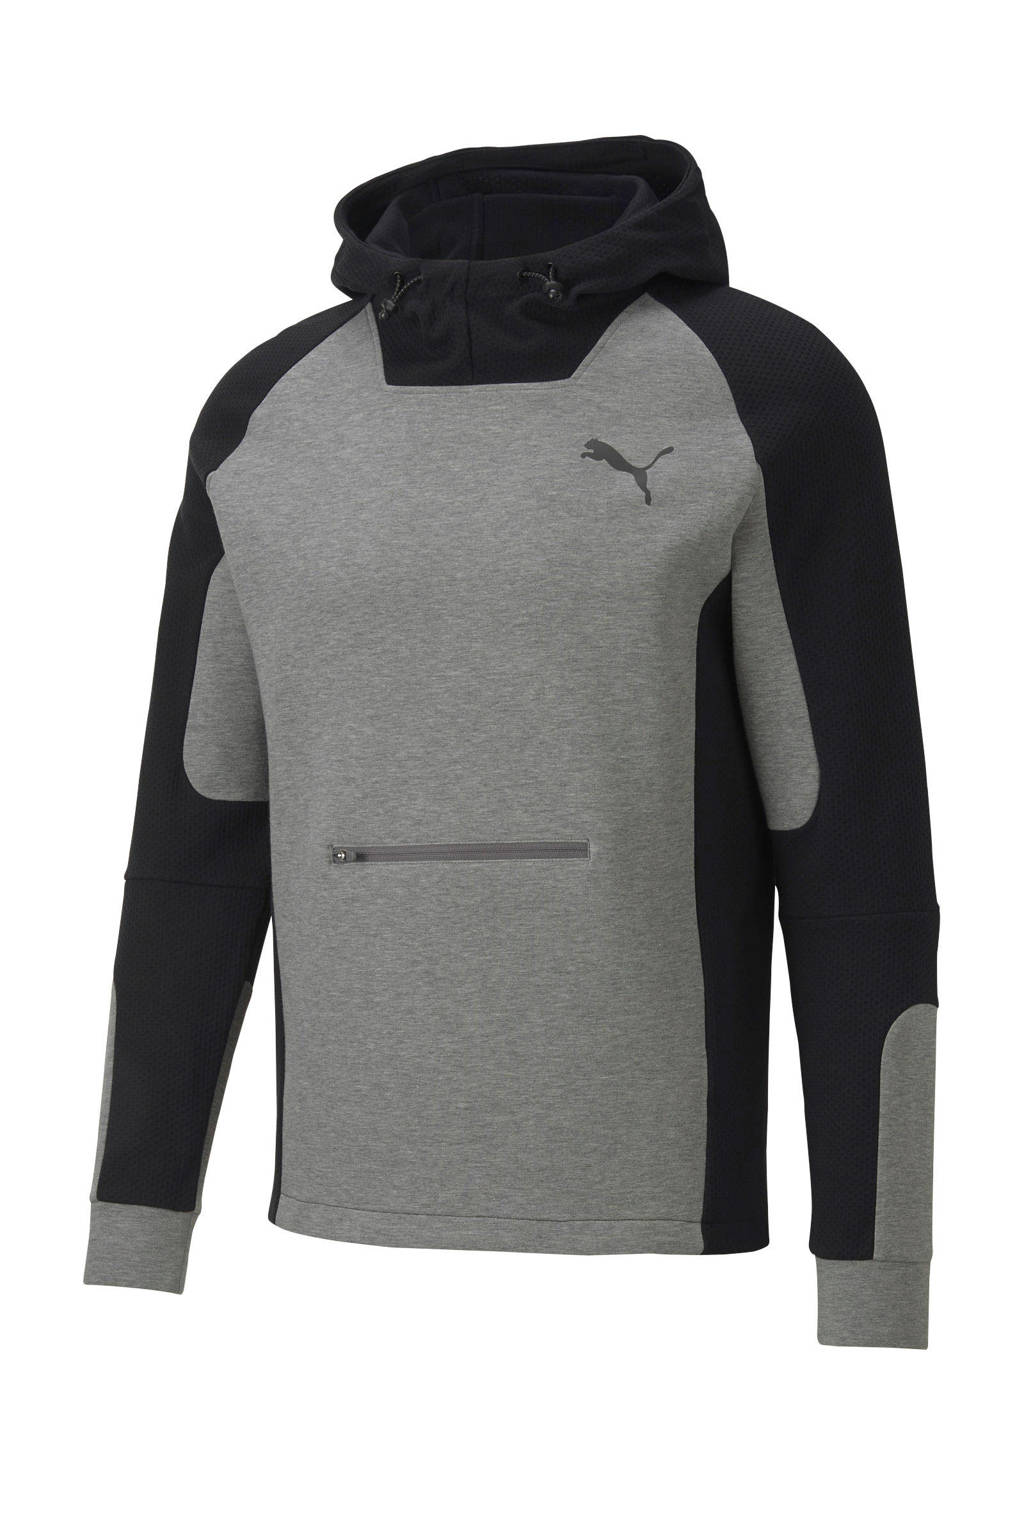 Puma   hoodie grijs/zwart, Grijs/zwart